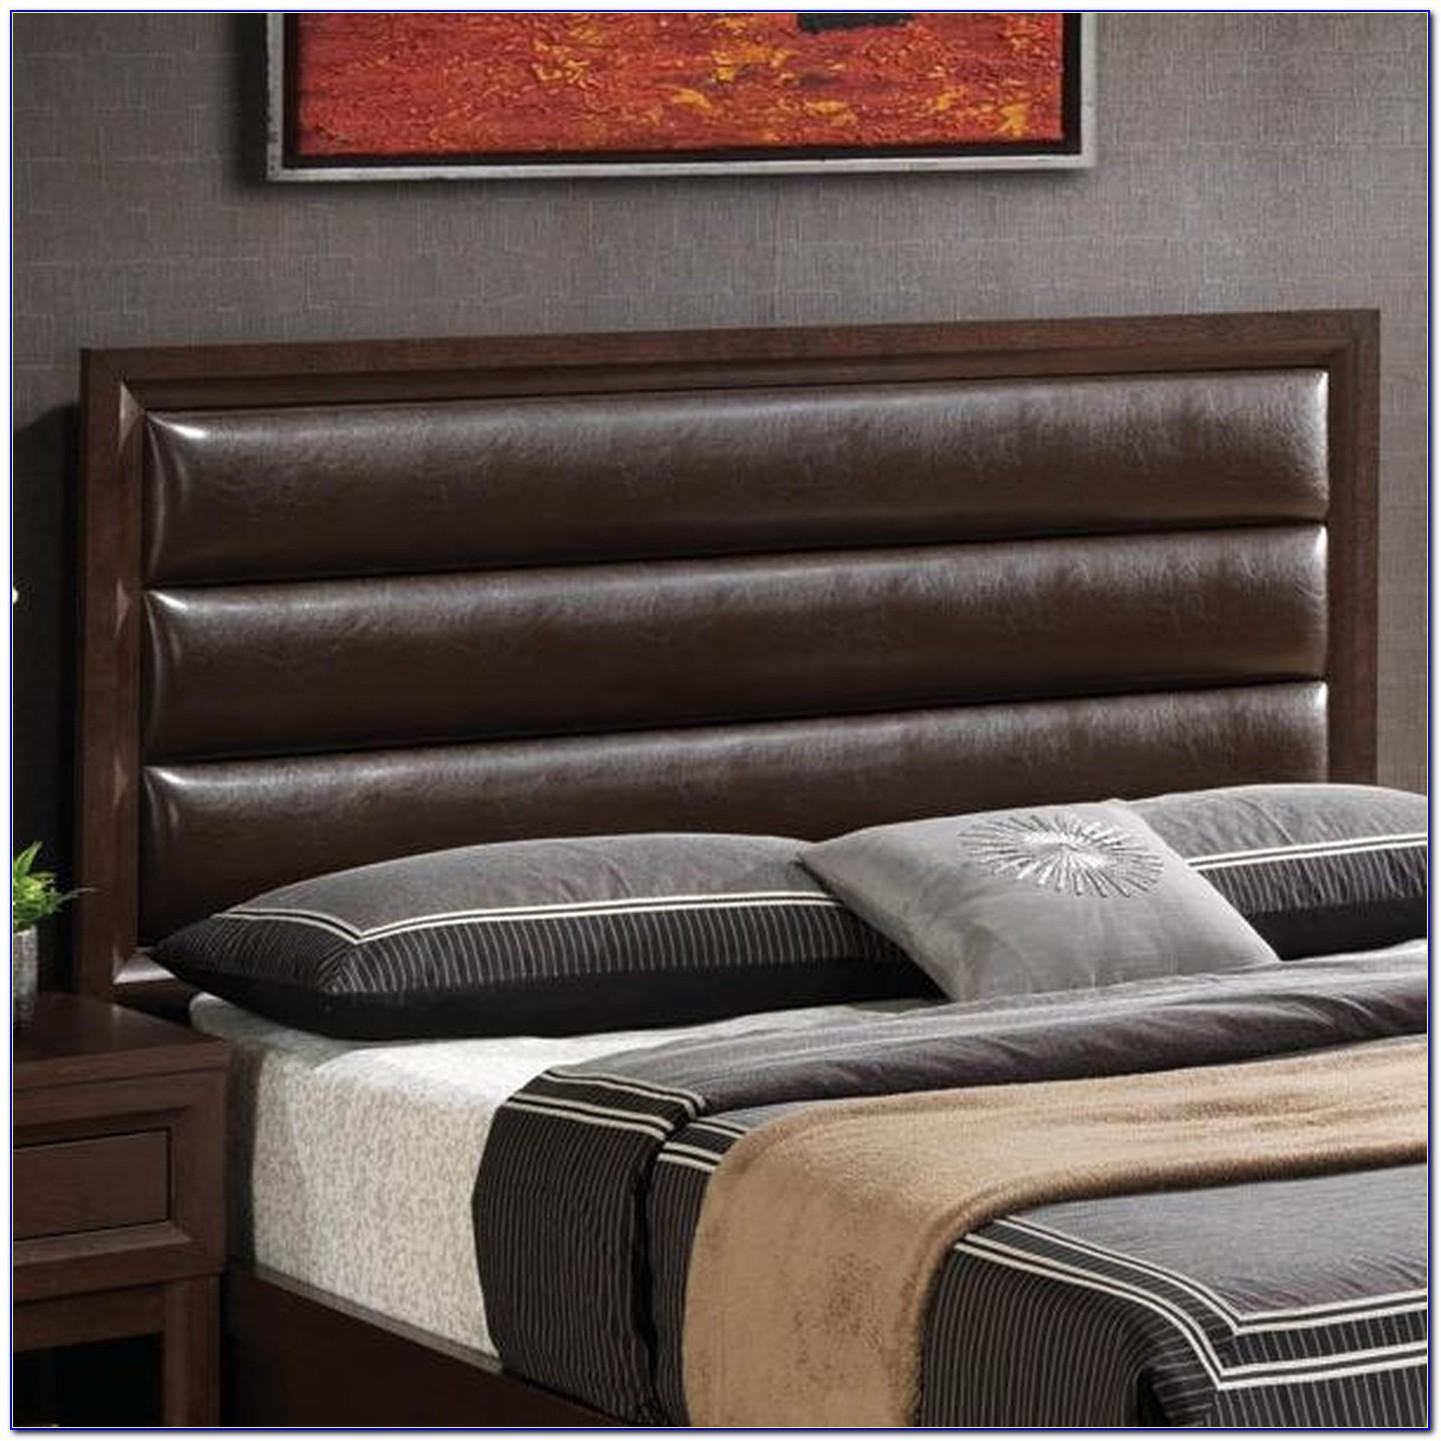 Fashion Bed Group King Headboard